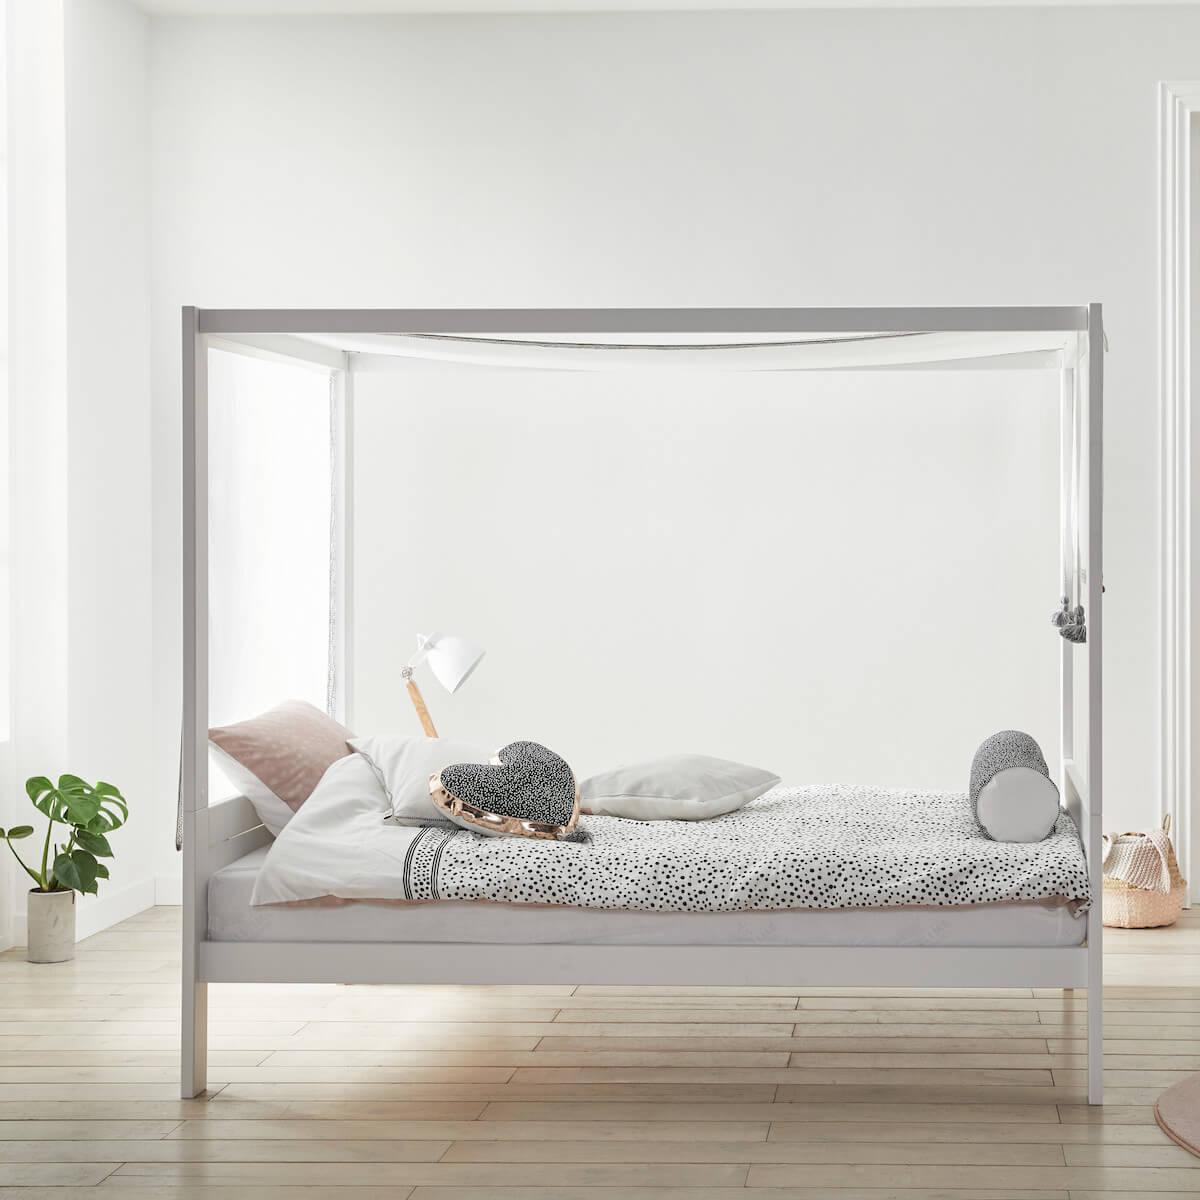 Cama dosel 120x200cm Lifetime gris